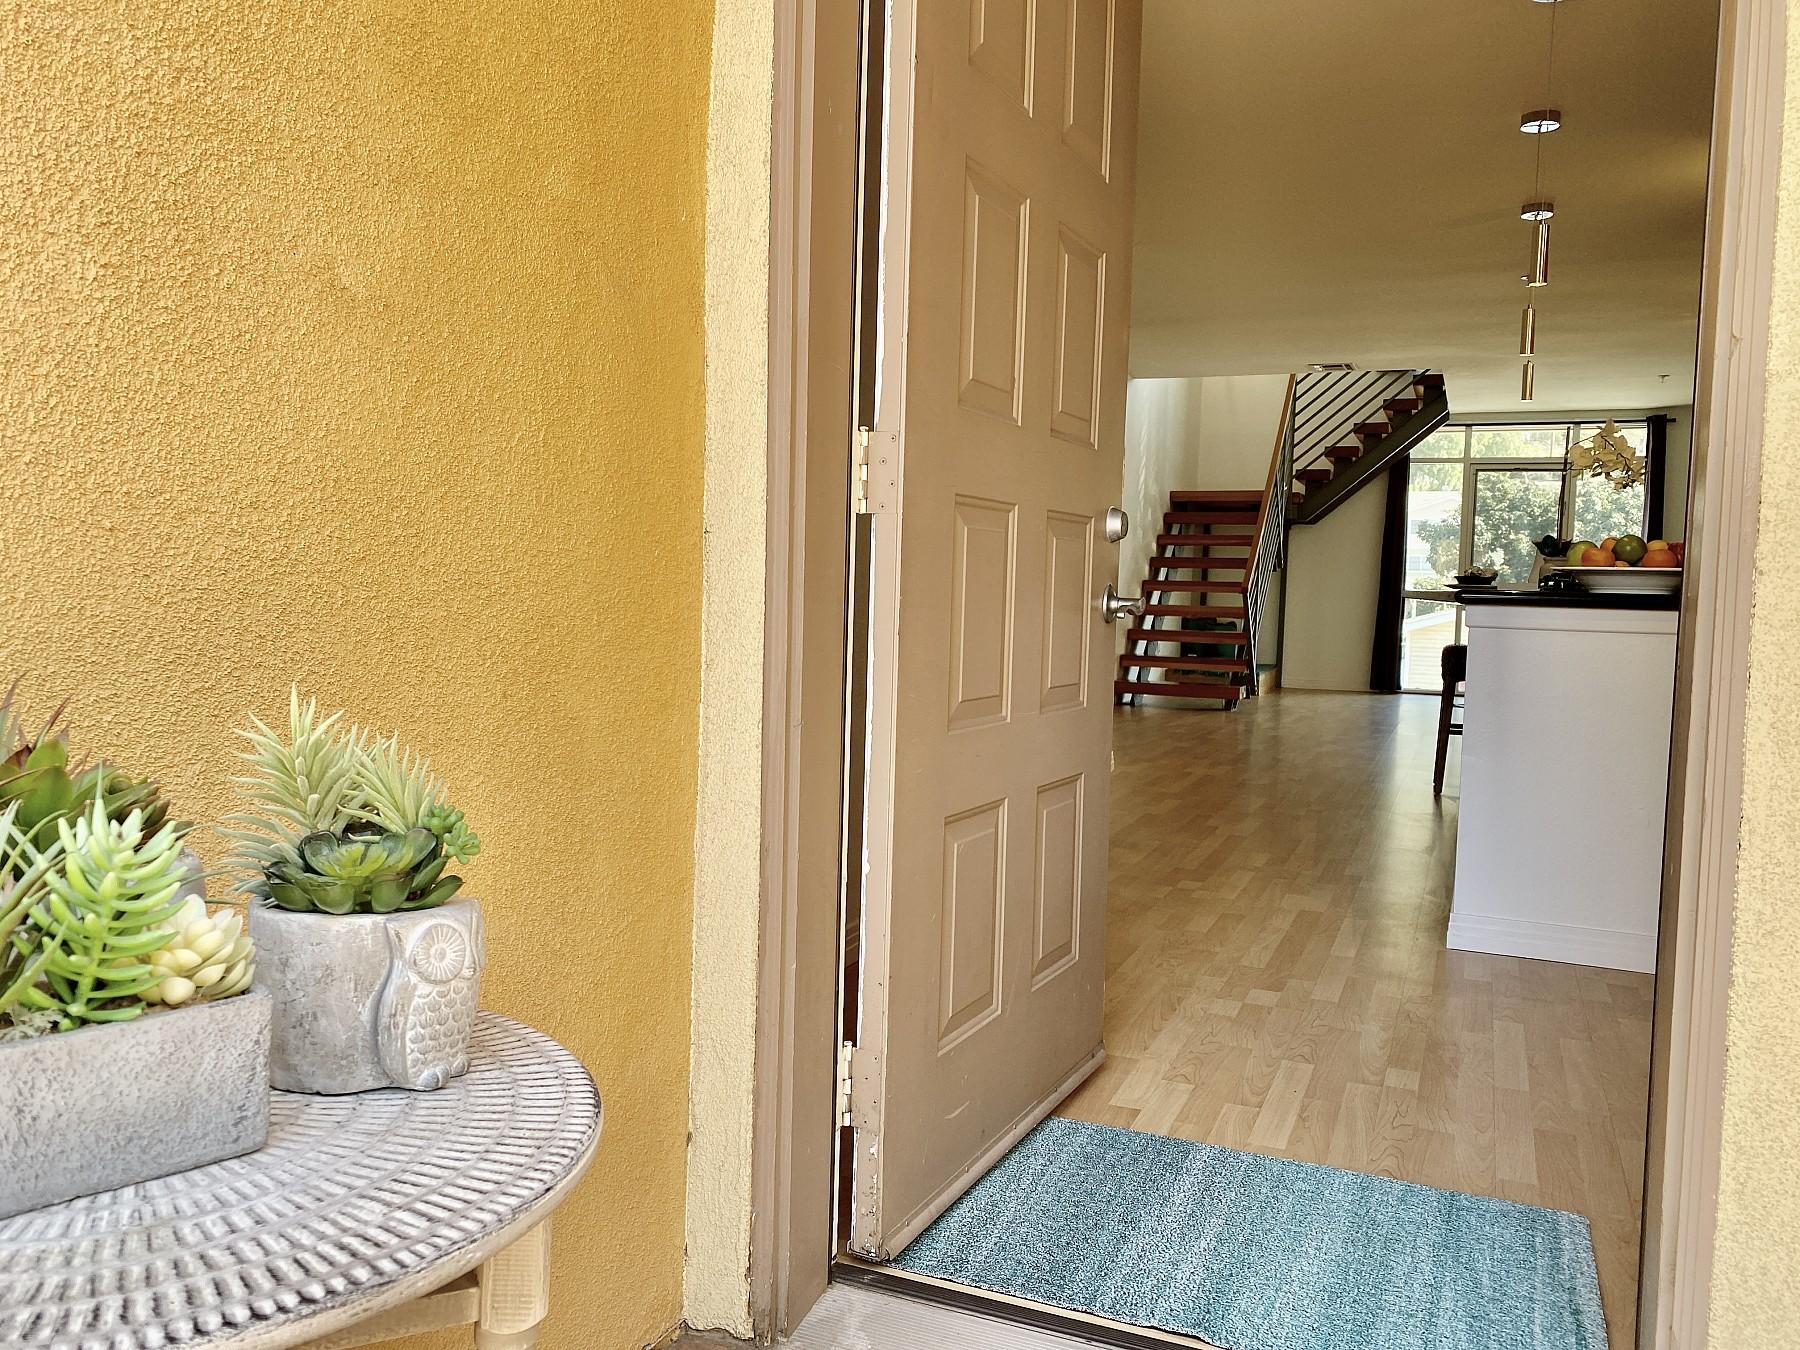 285 N. Ventura Ave, Unit 8, Ventura, CA 93001